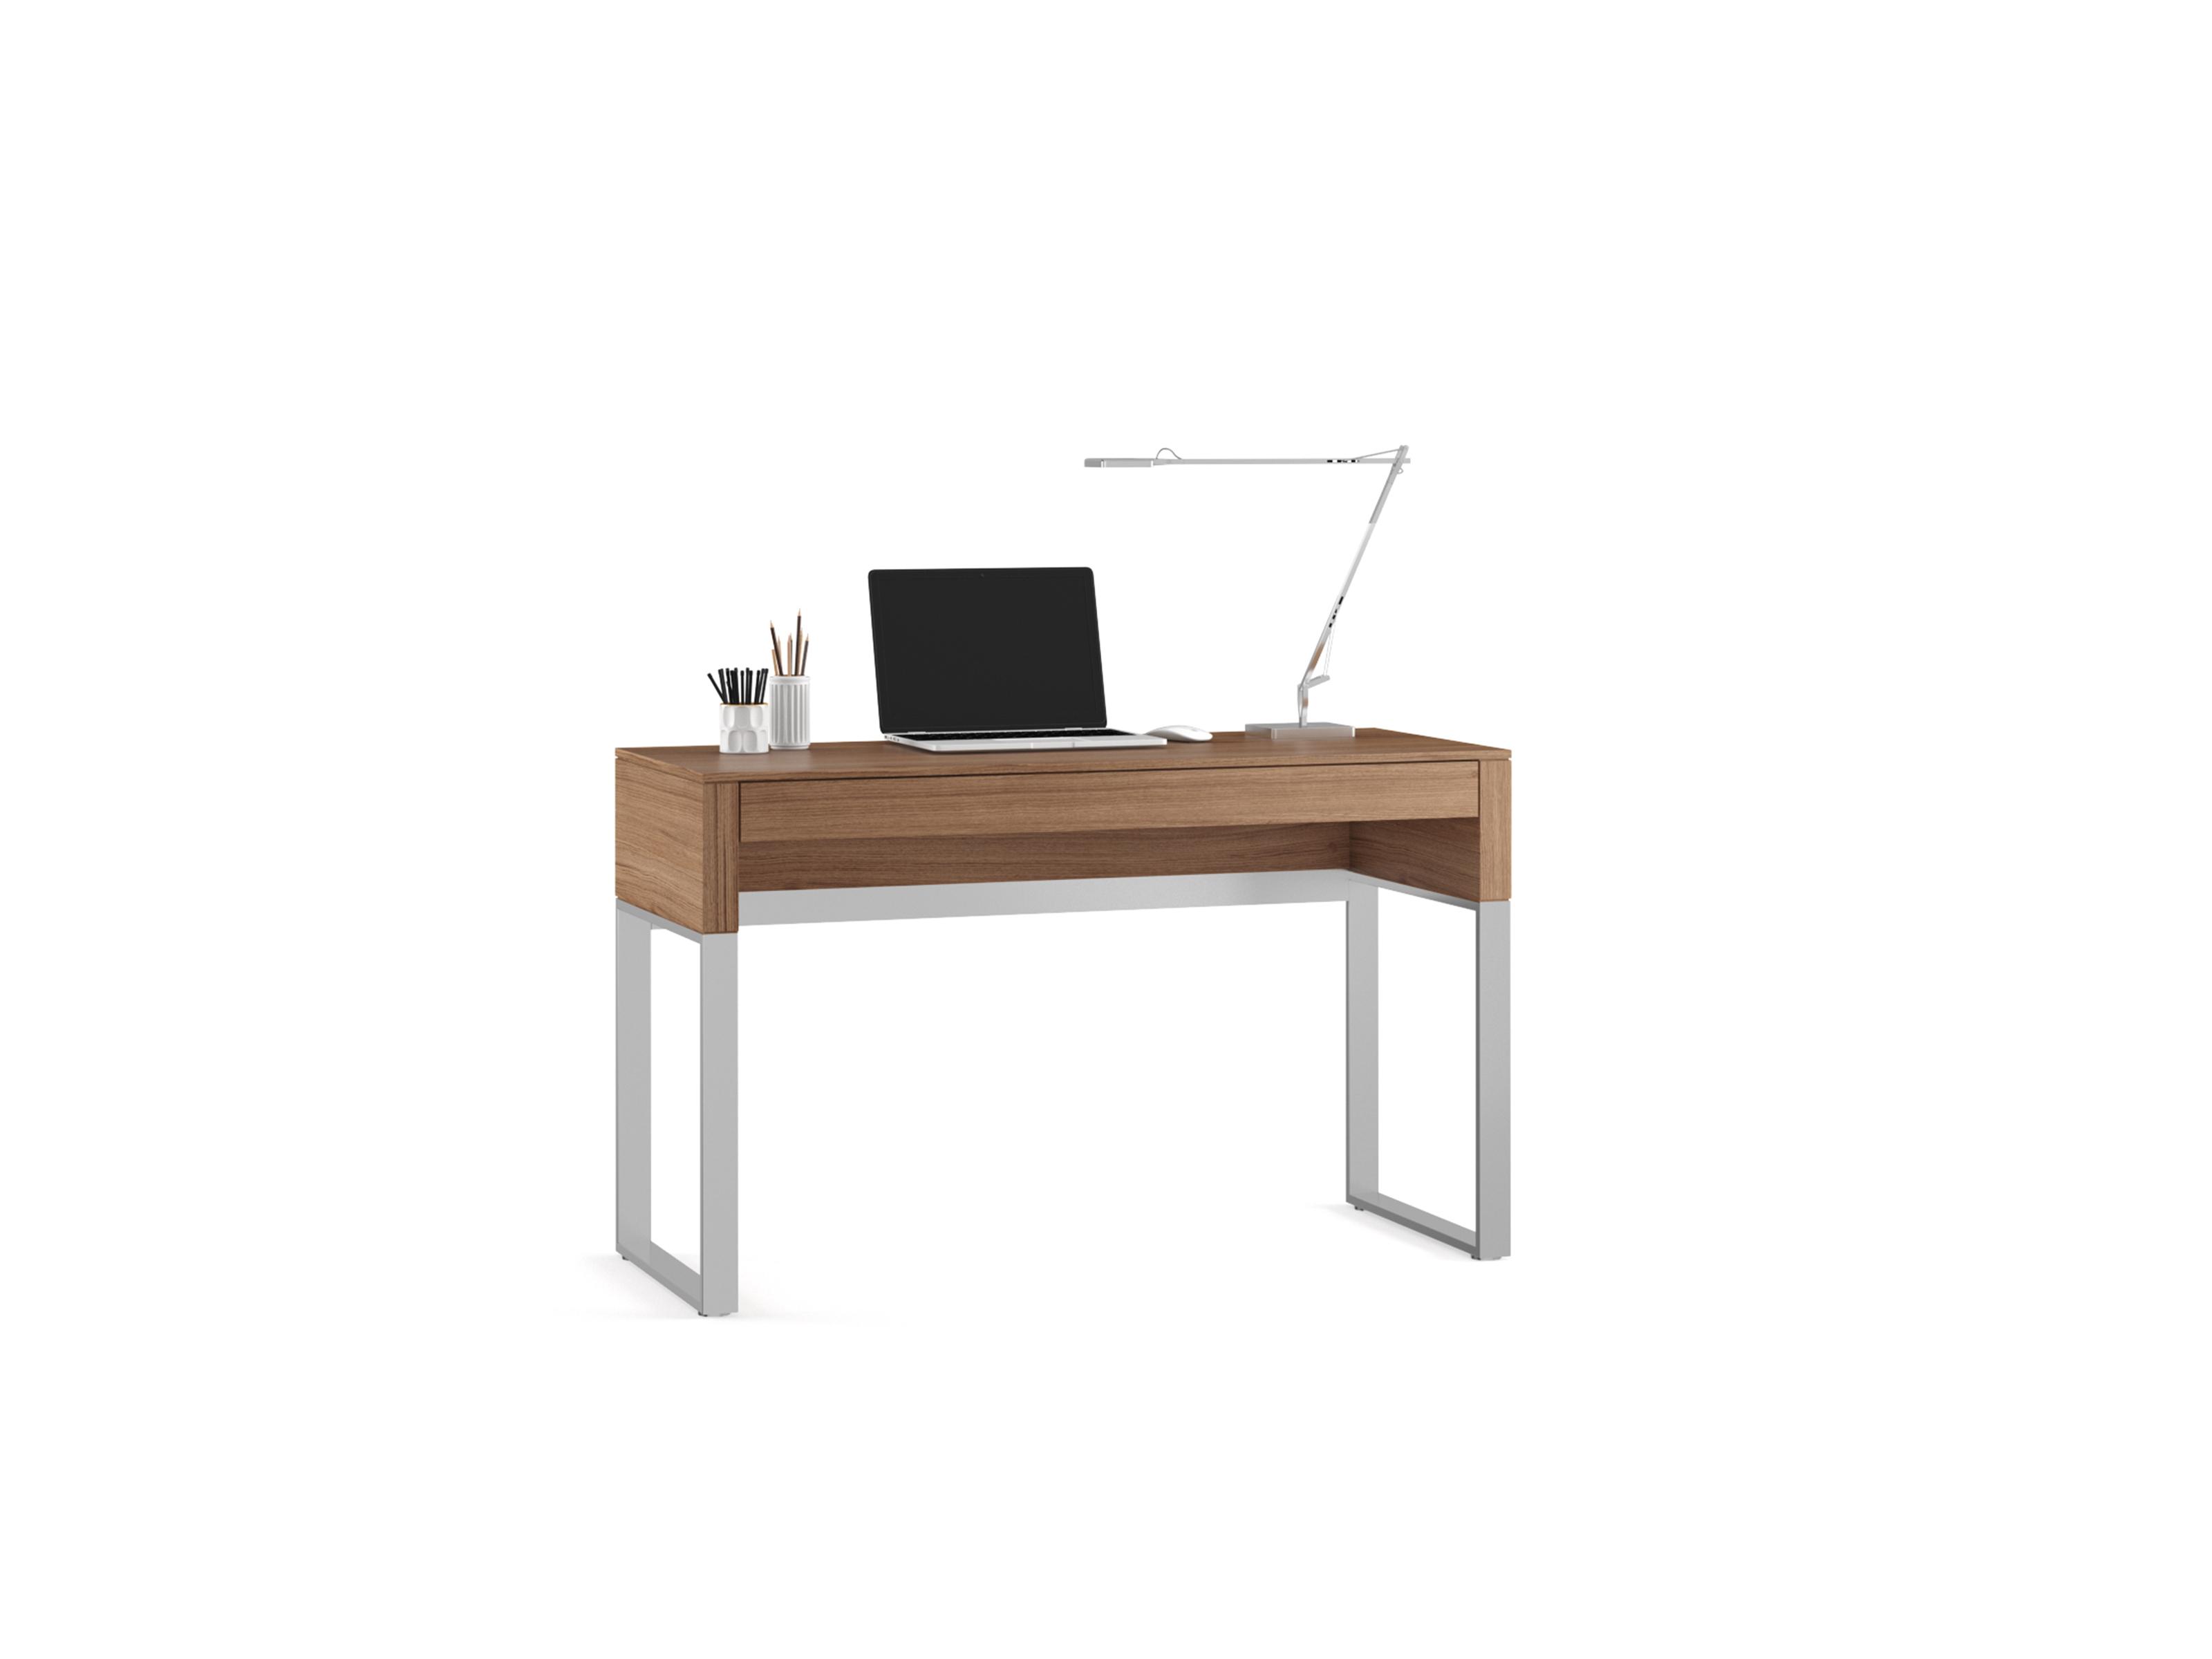 Image of: Cascadia 6202 Slim Console Laptop Desk Bdi Furniture